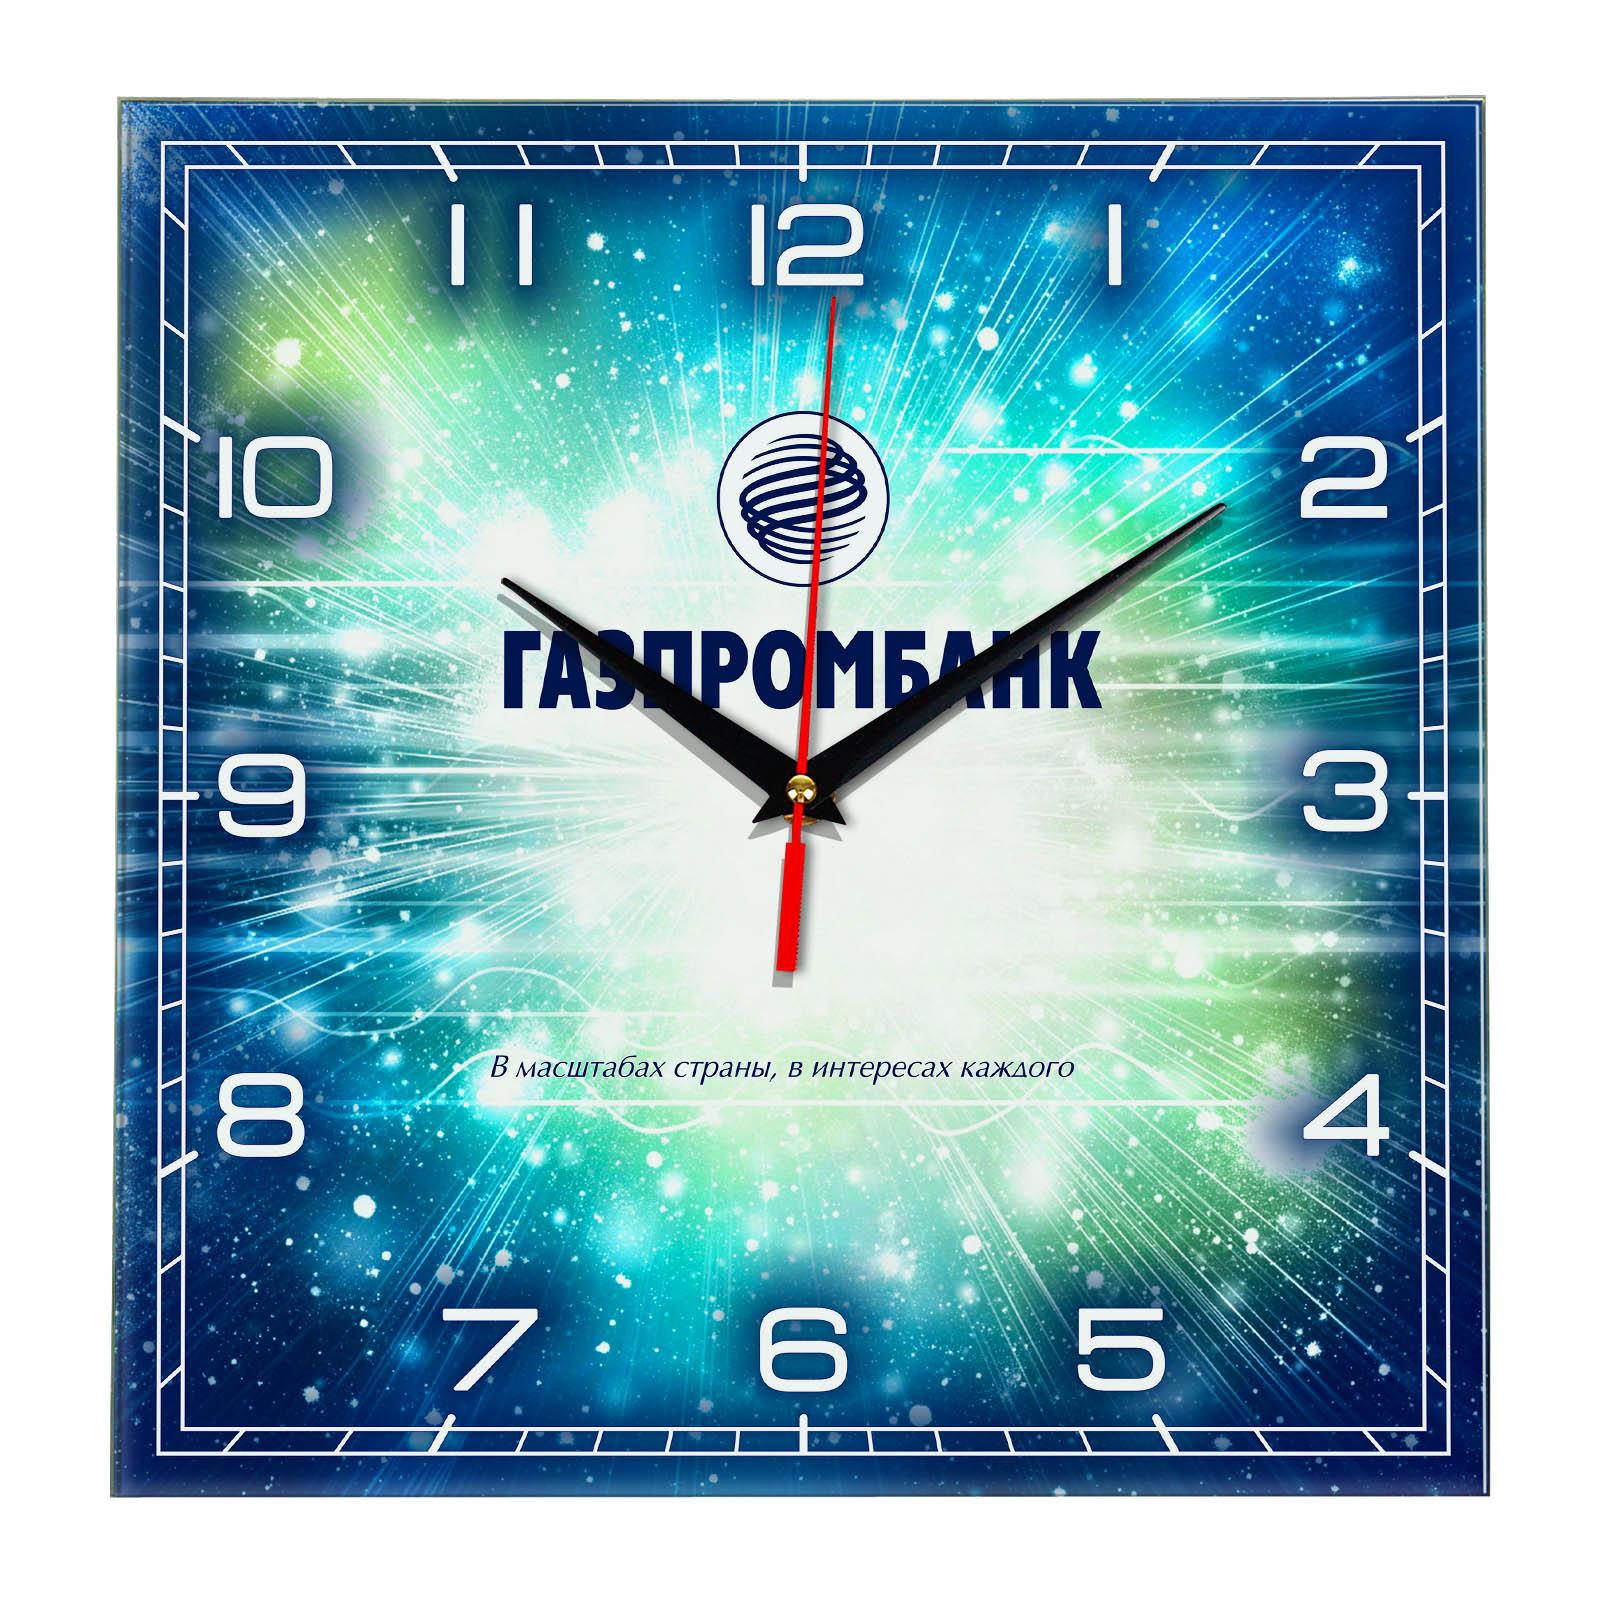 Gazprombank_clock_0013_svetl-kvadtat